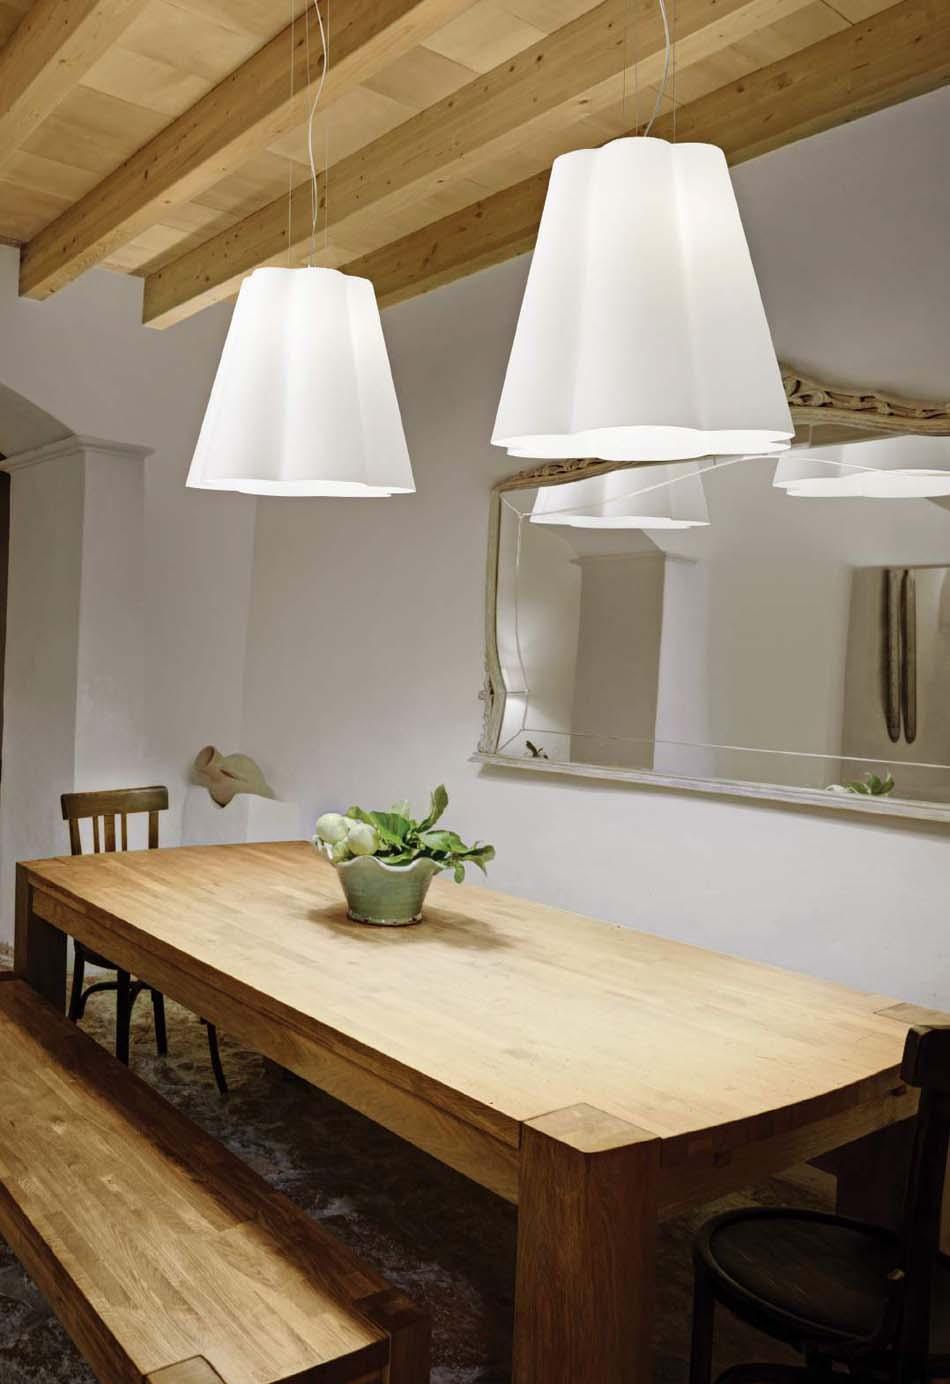 Lampade sospese Ideal Lux Sesto – Toscana Arredamenti